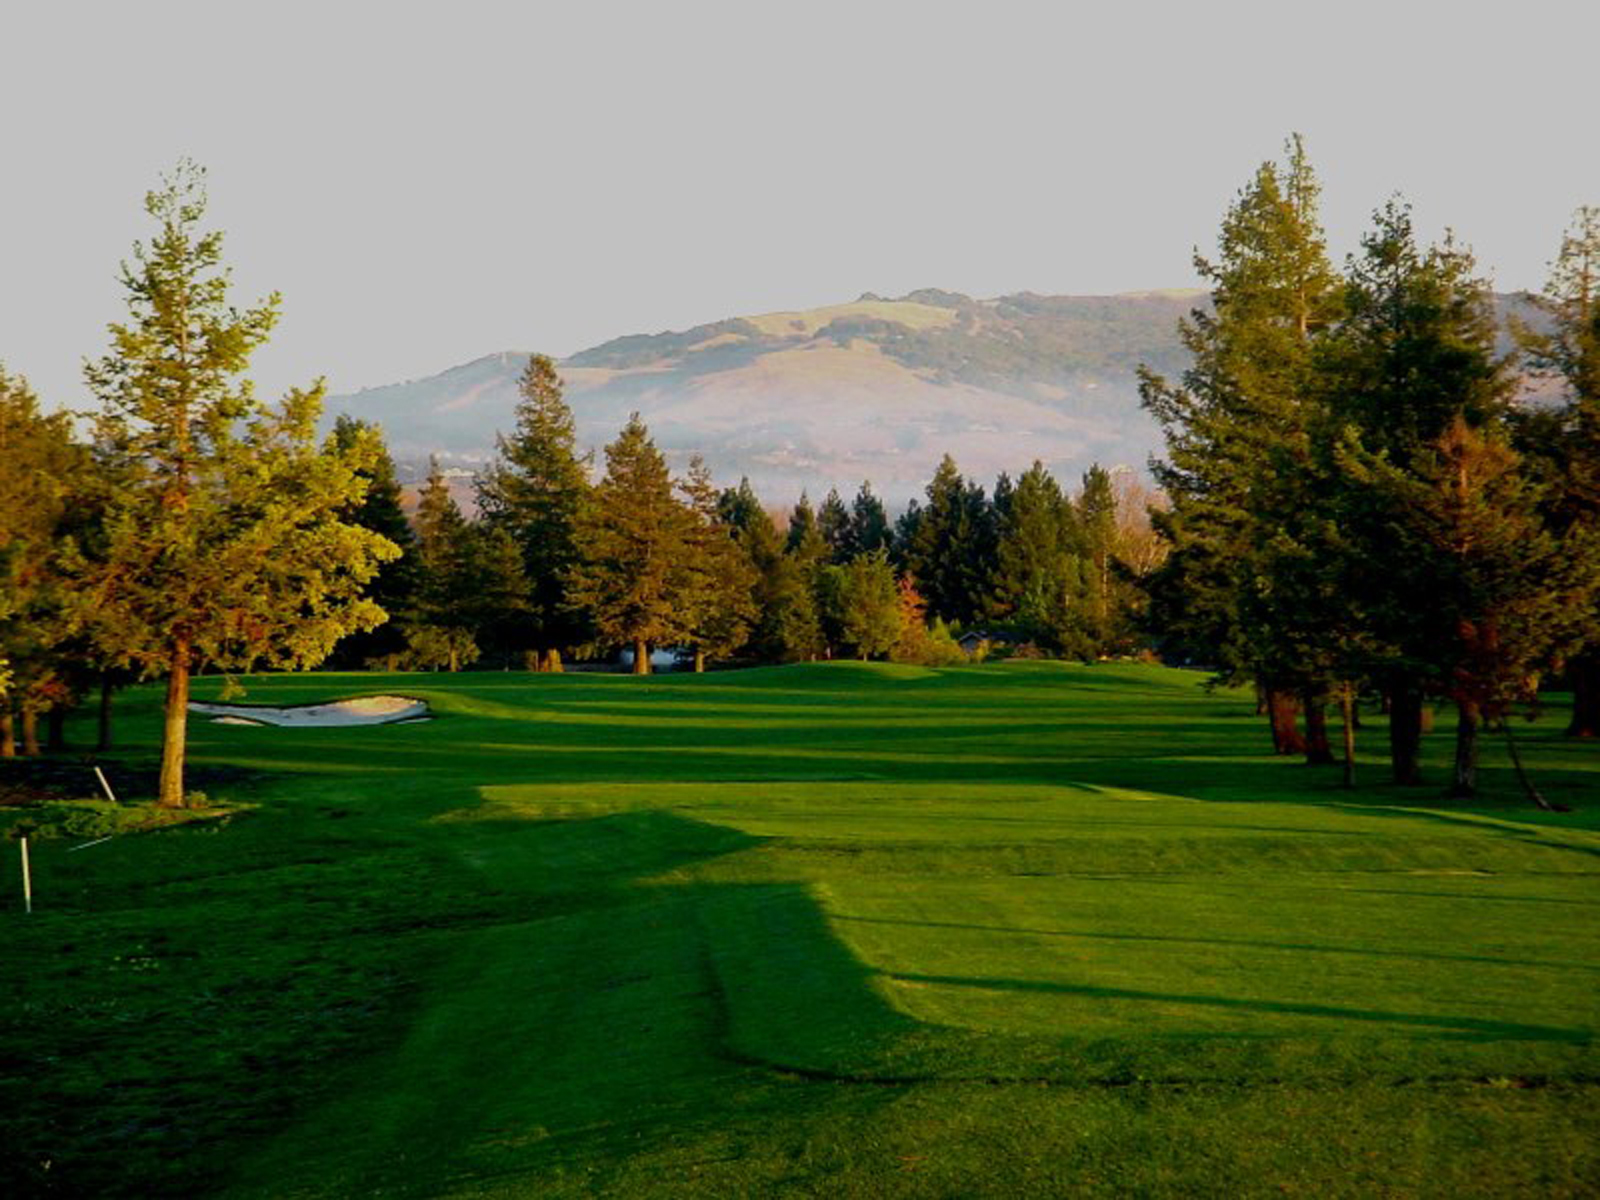 "<a href=""https://www.bnaiisrael.net/membership-giving/donate-support/golf-tournament""                                     target="""">                                                                 <span class=""slider_title"">                                     Golf Tournament                                </span>                                                                 </a>                                                                                                                                                                                       <span class=""slider_description"">Support BIJC at the 11th Annual Golf Tournament on Oct. 13 at Foxtail Golf Club.</span>                                                                                     <a href=""https://www.bnaiisrael.net/membership-giving/donate-support/golf-tournament"" class=""slider_link""                             target="""">                             Read More                            </a>"